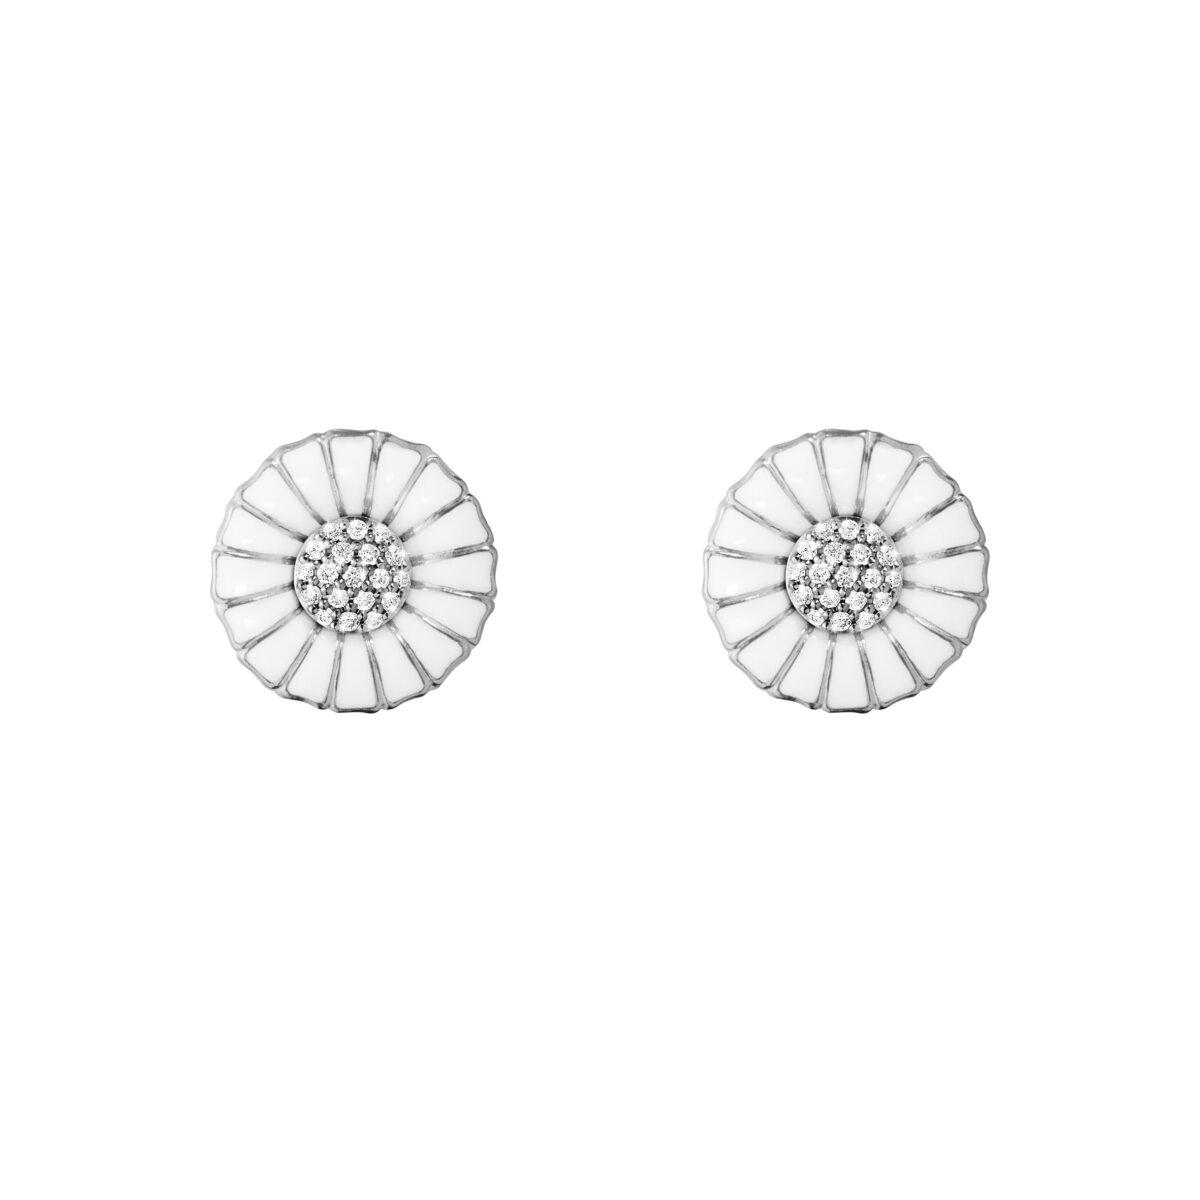 product/1/0/10010538_daisy_earrings_silver_rh_white_enamel_11mm_diamond_pave__0.1_1__jpg_max_3000x3000_423762.jpg